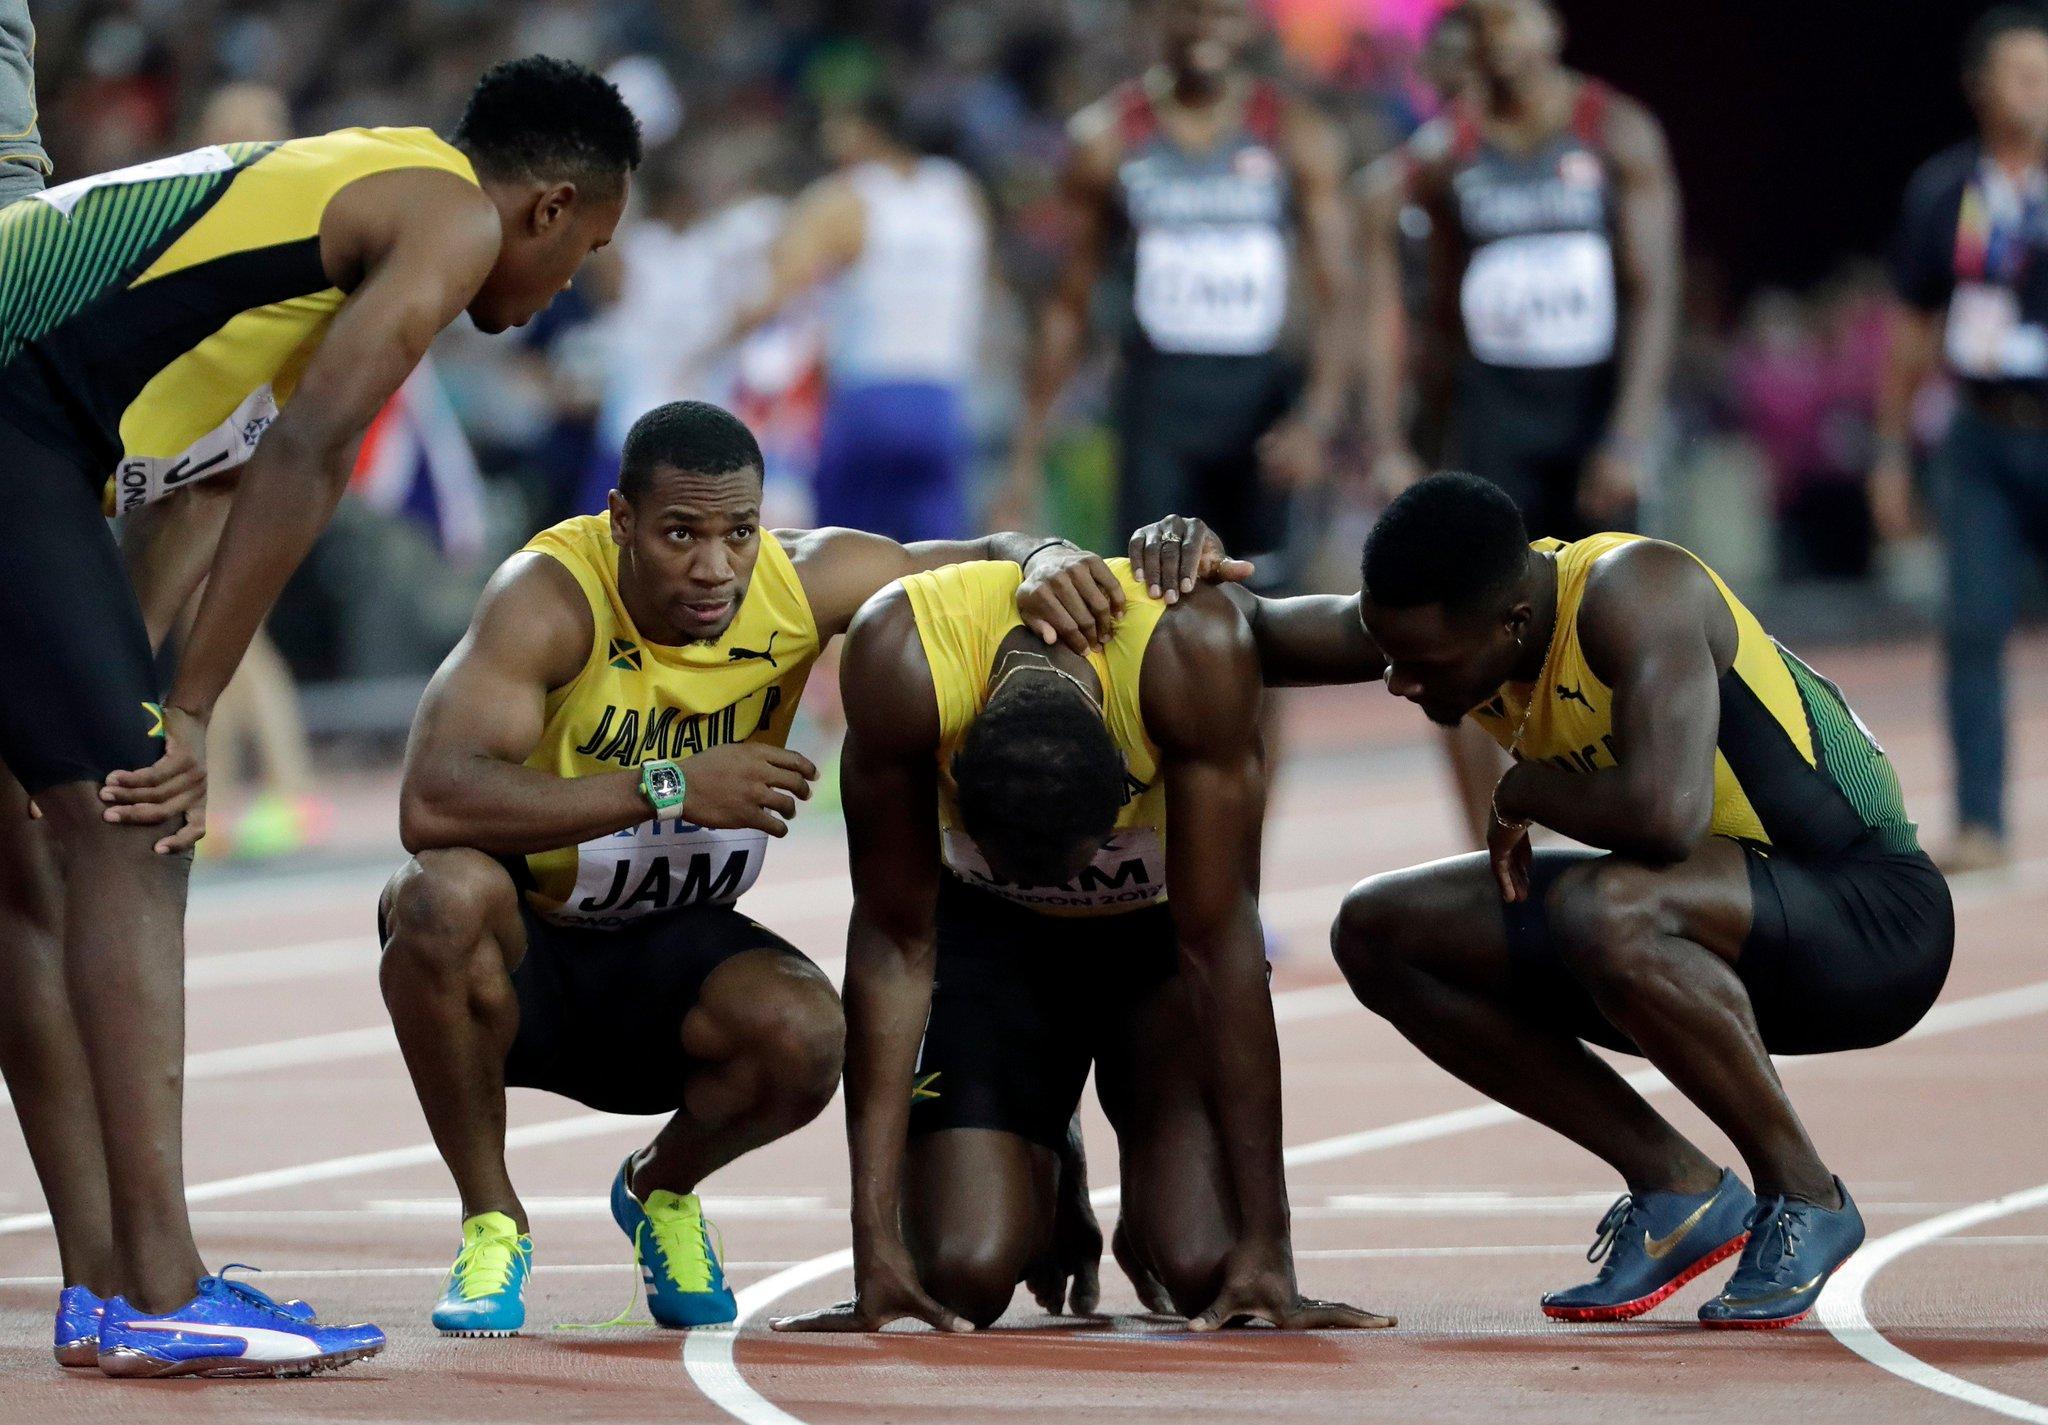 Usain Bolt breaks down in tears after pulling up injured in final career race https://t.co/el3TMavcDG https://t.co/4xlBnVbKgJ